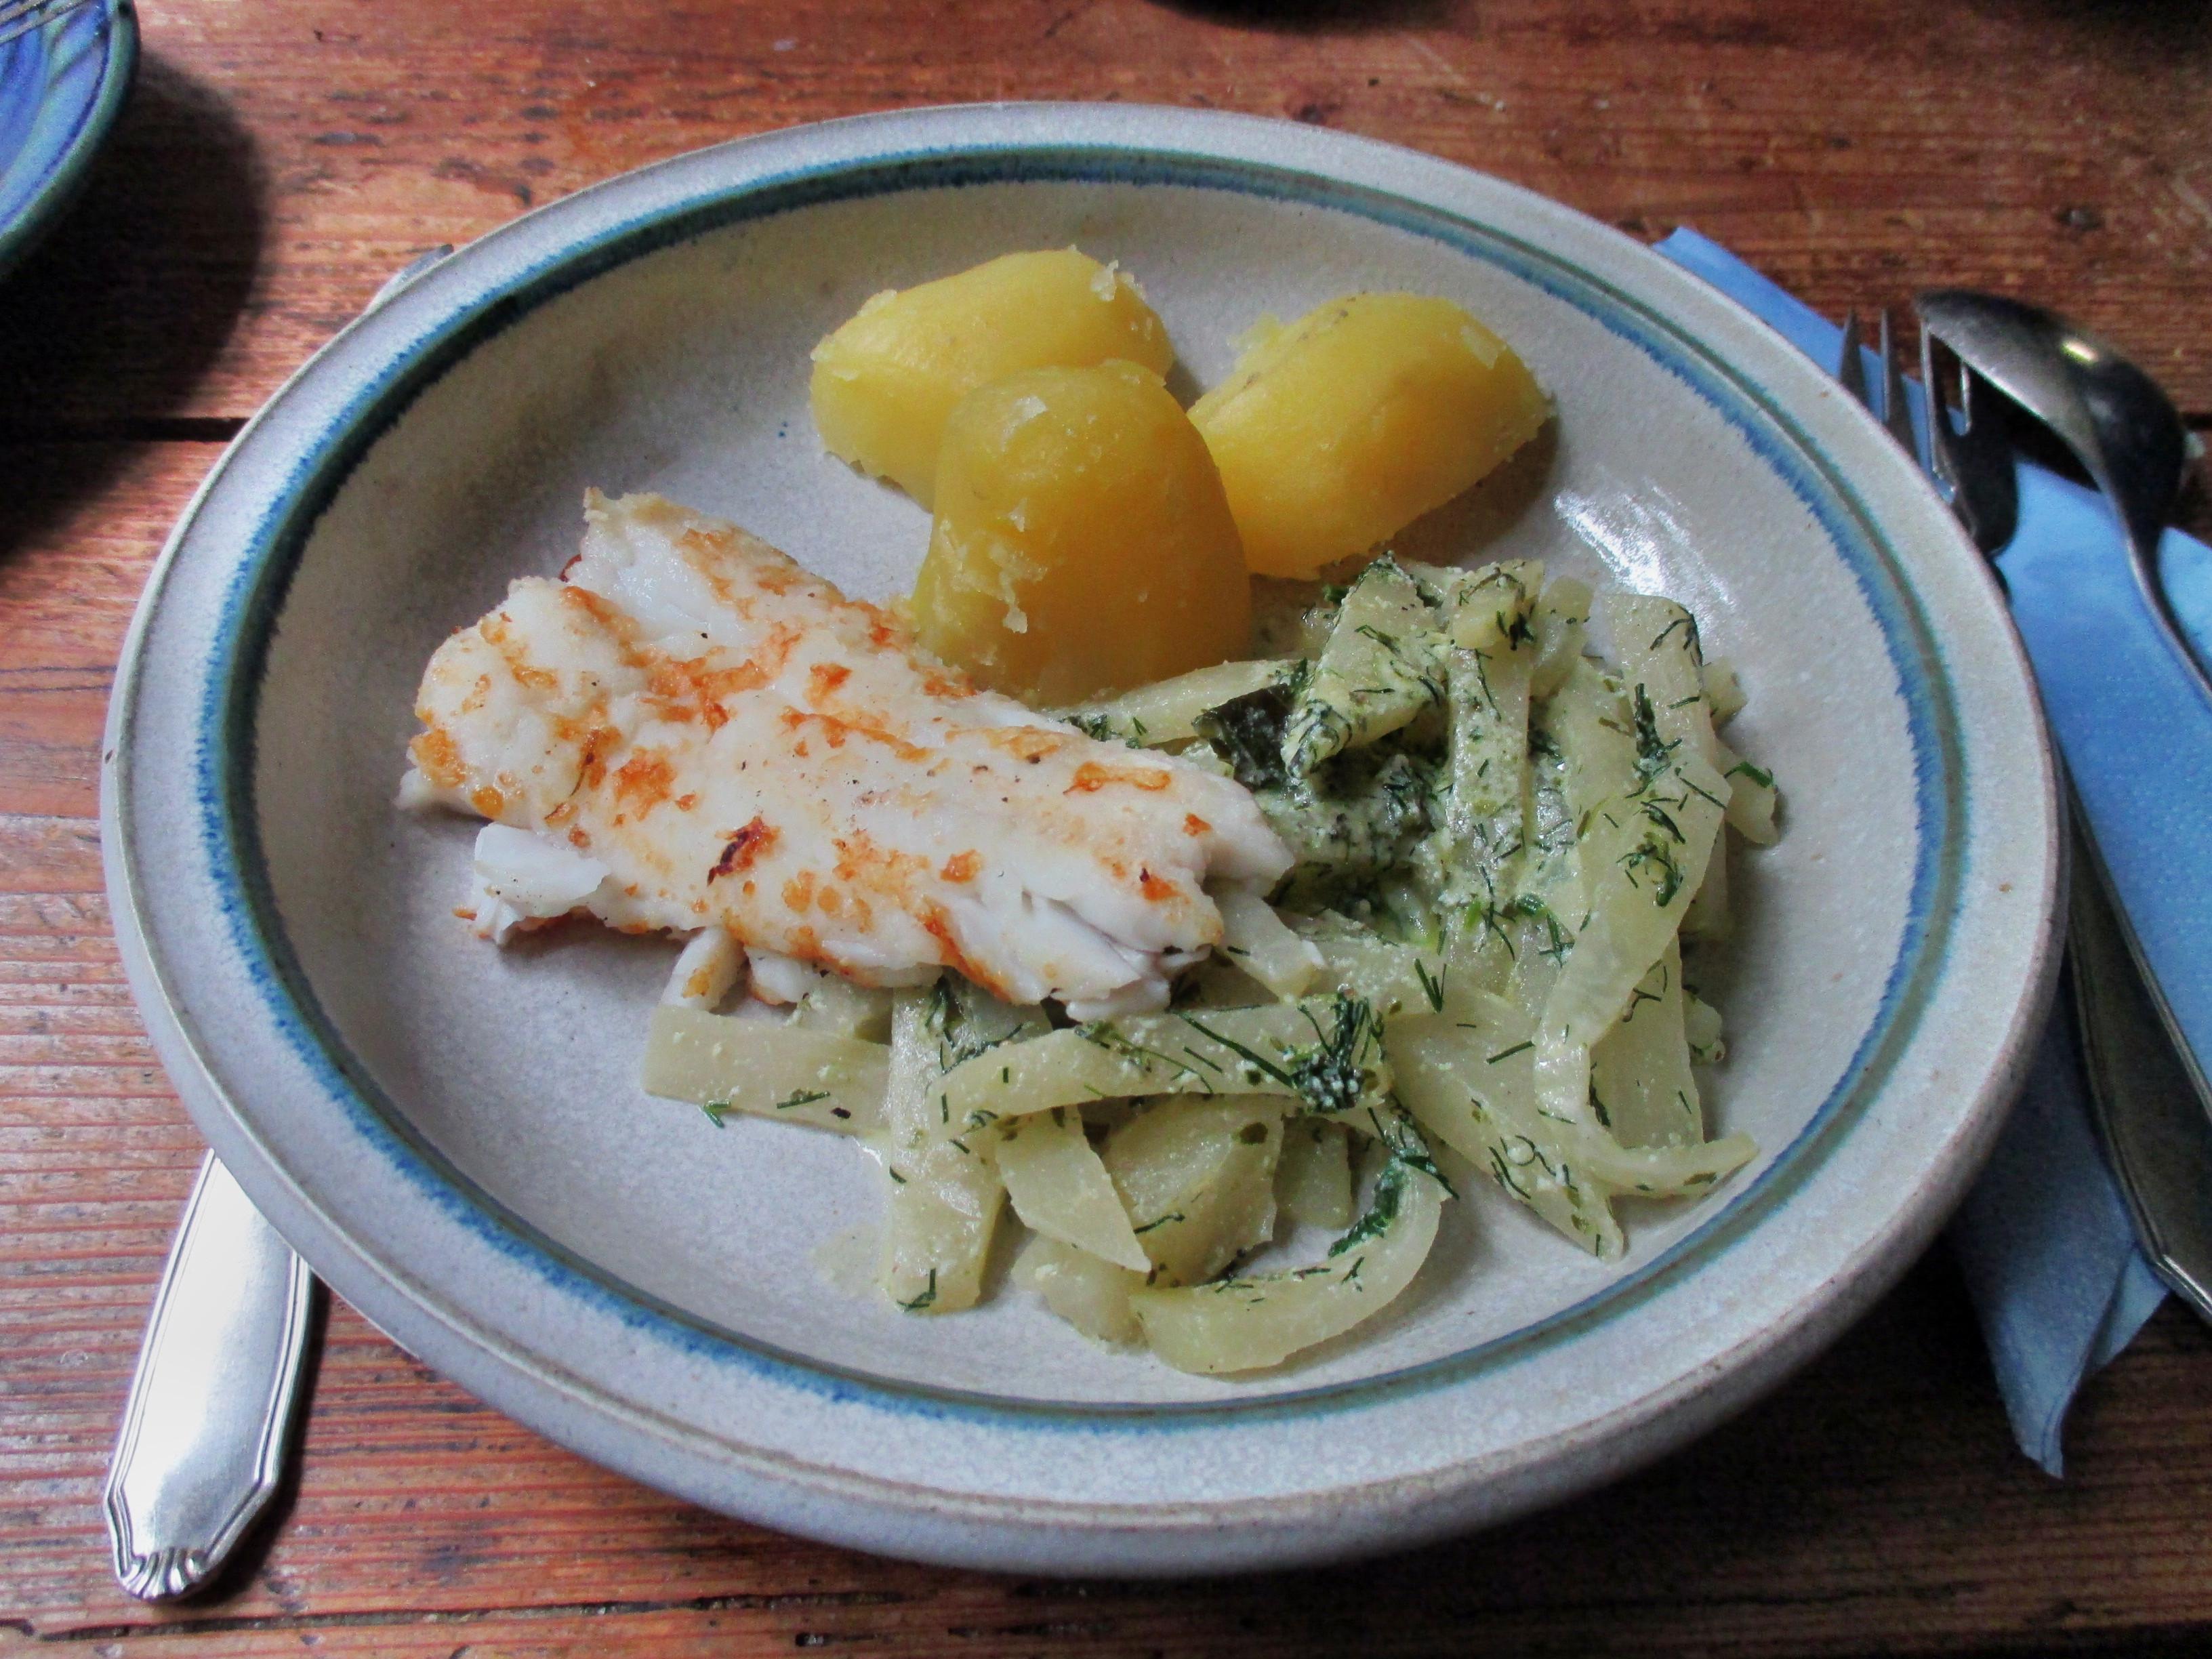 Kabeljau,Kohlrabigemüse,Salzkartoffeln,Salat -9.6.15   (11)